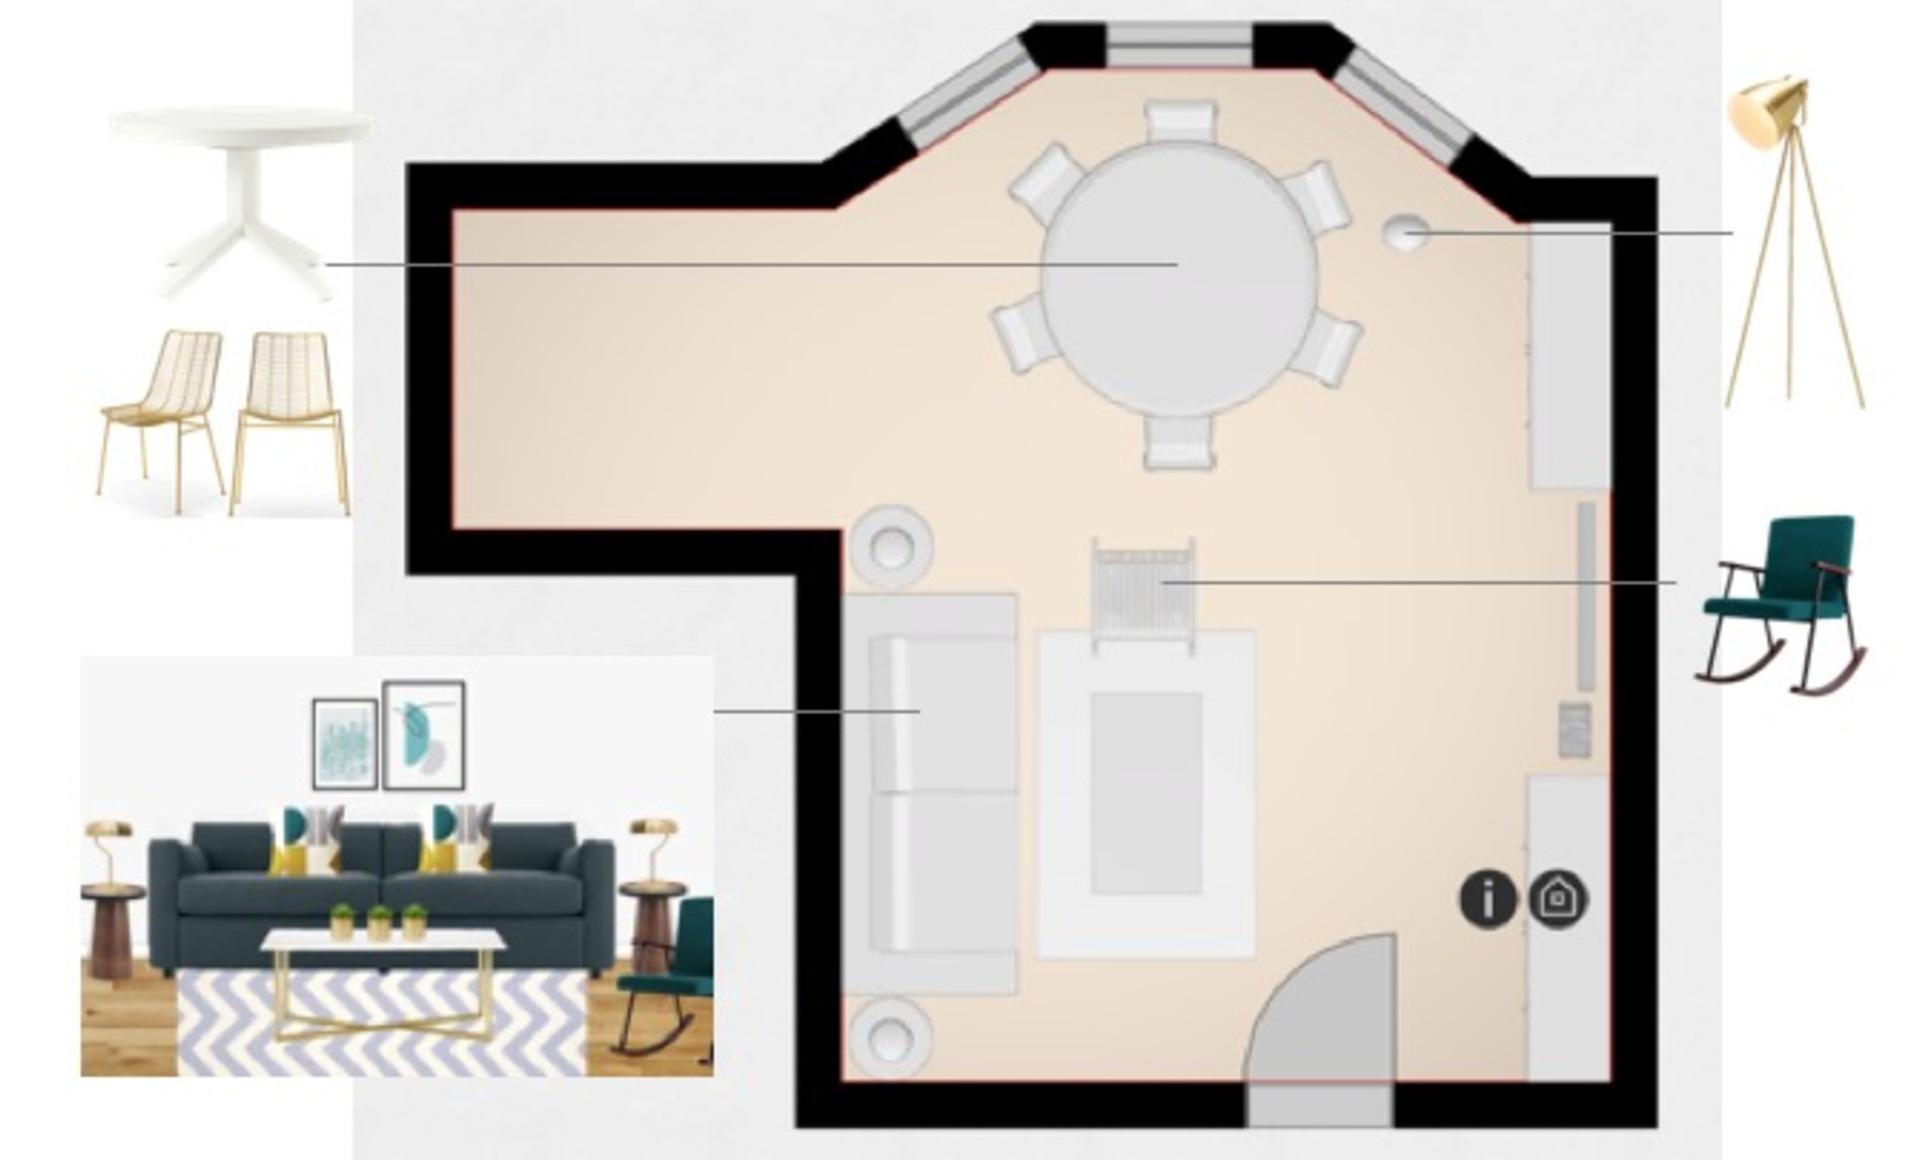 Mbr gwenbabayer livingroom floorplan03